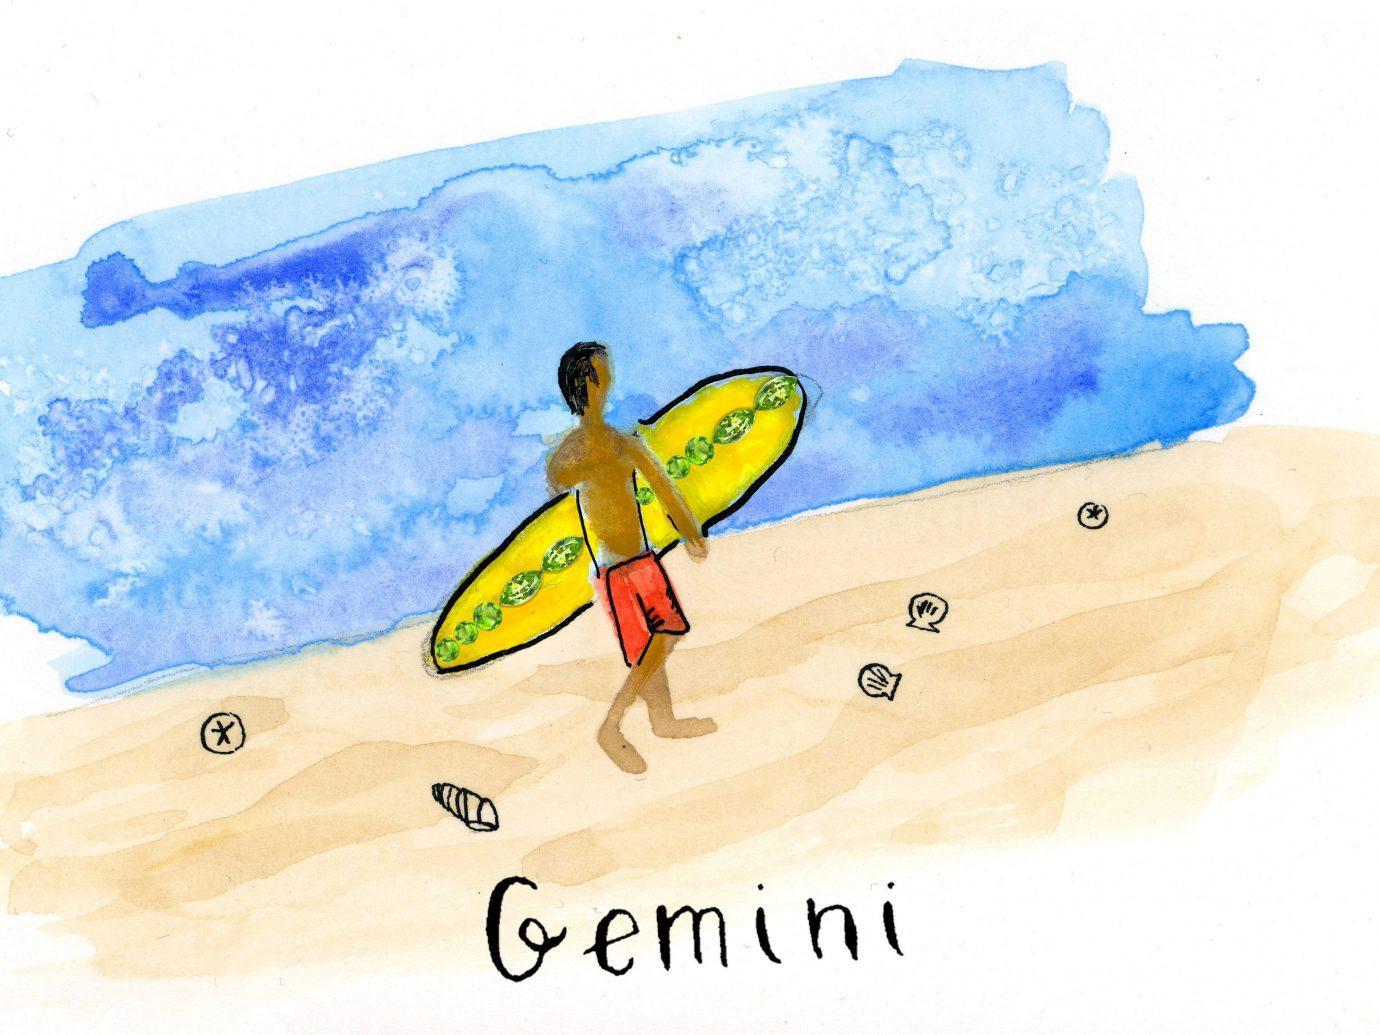 Trip Ideas cartoon surfing equipment and supplies illustration flightless bird surfboard